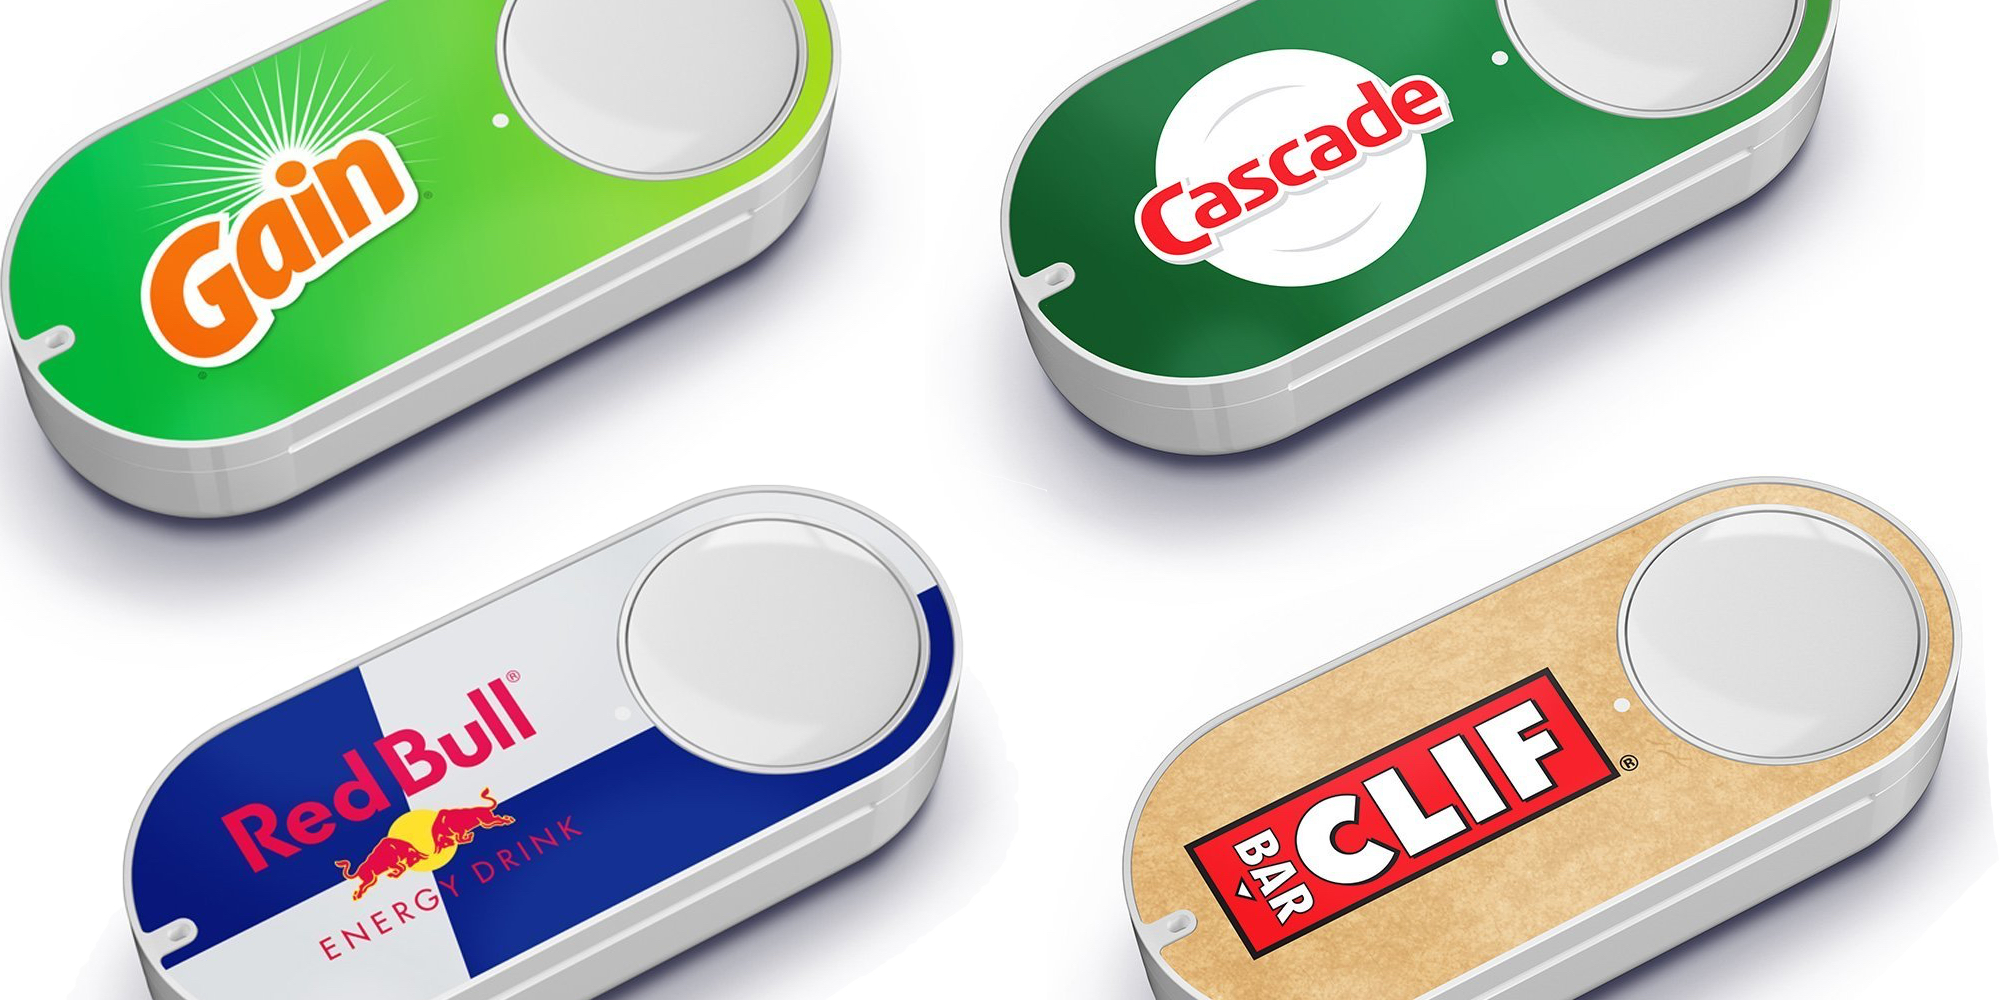 Amazon Dash Button brands